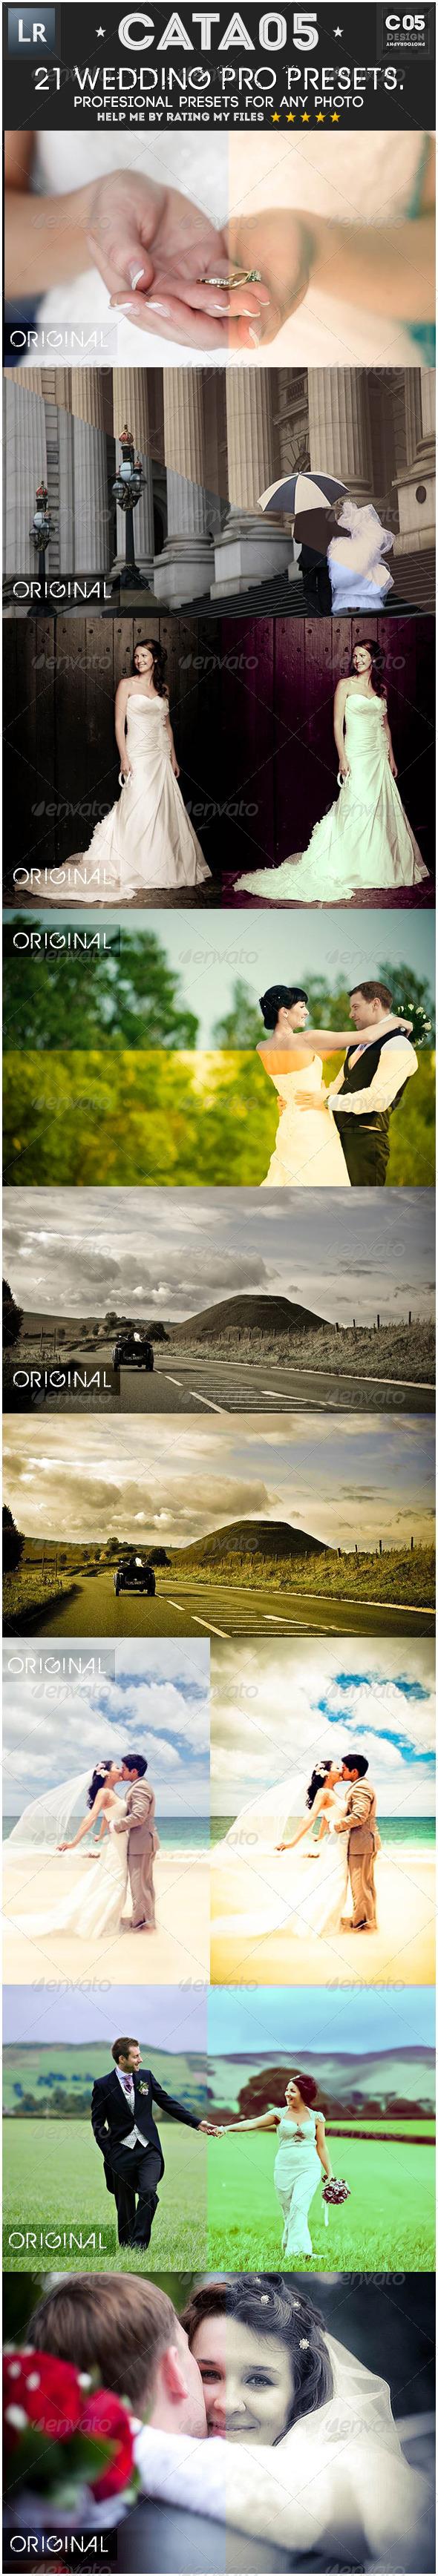 GraphicRiver 21 Wedding Pro Presets 5603685